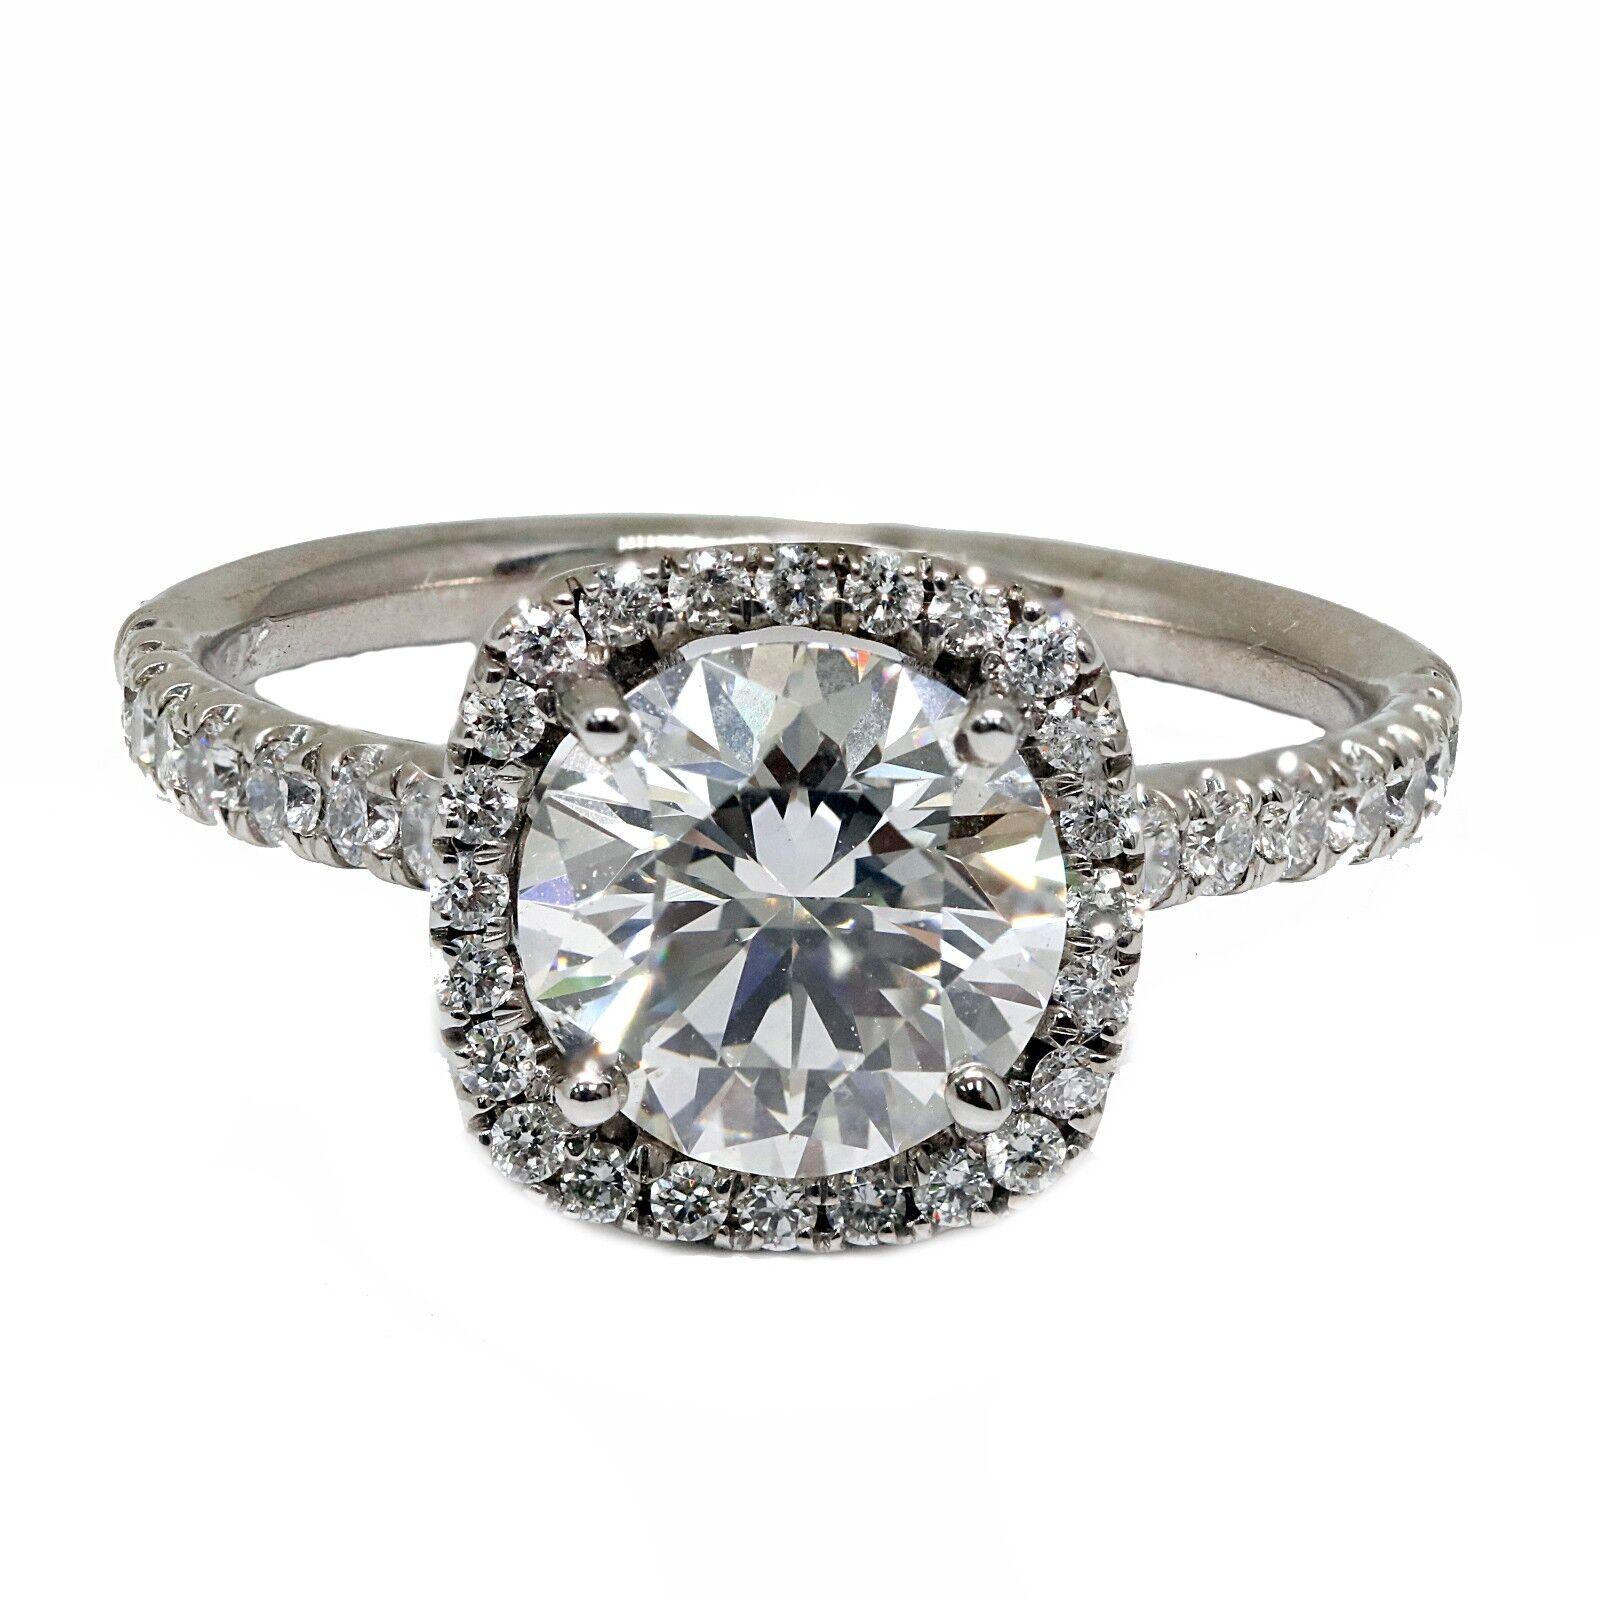 2.42 Carat  Round Diamond Halo Engagement Ring 14k White Gold